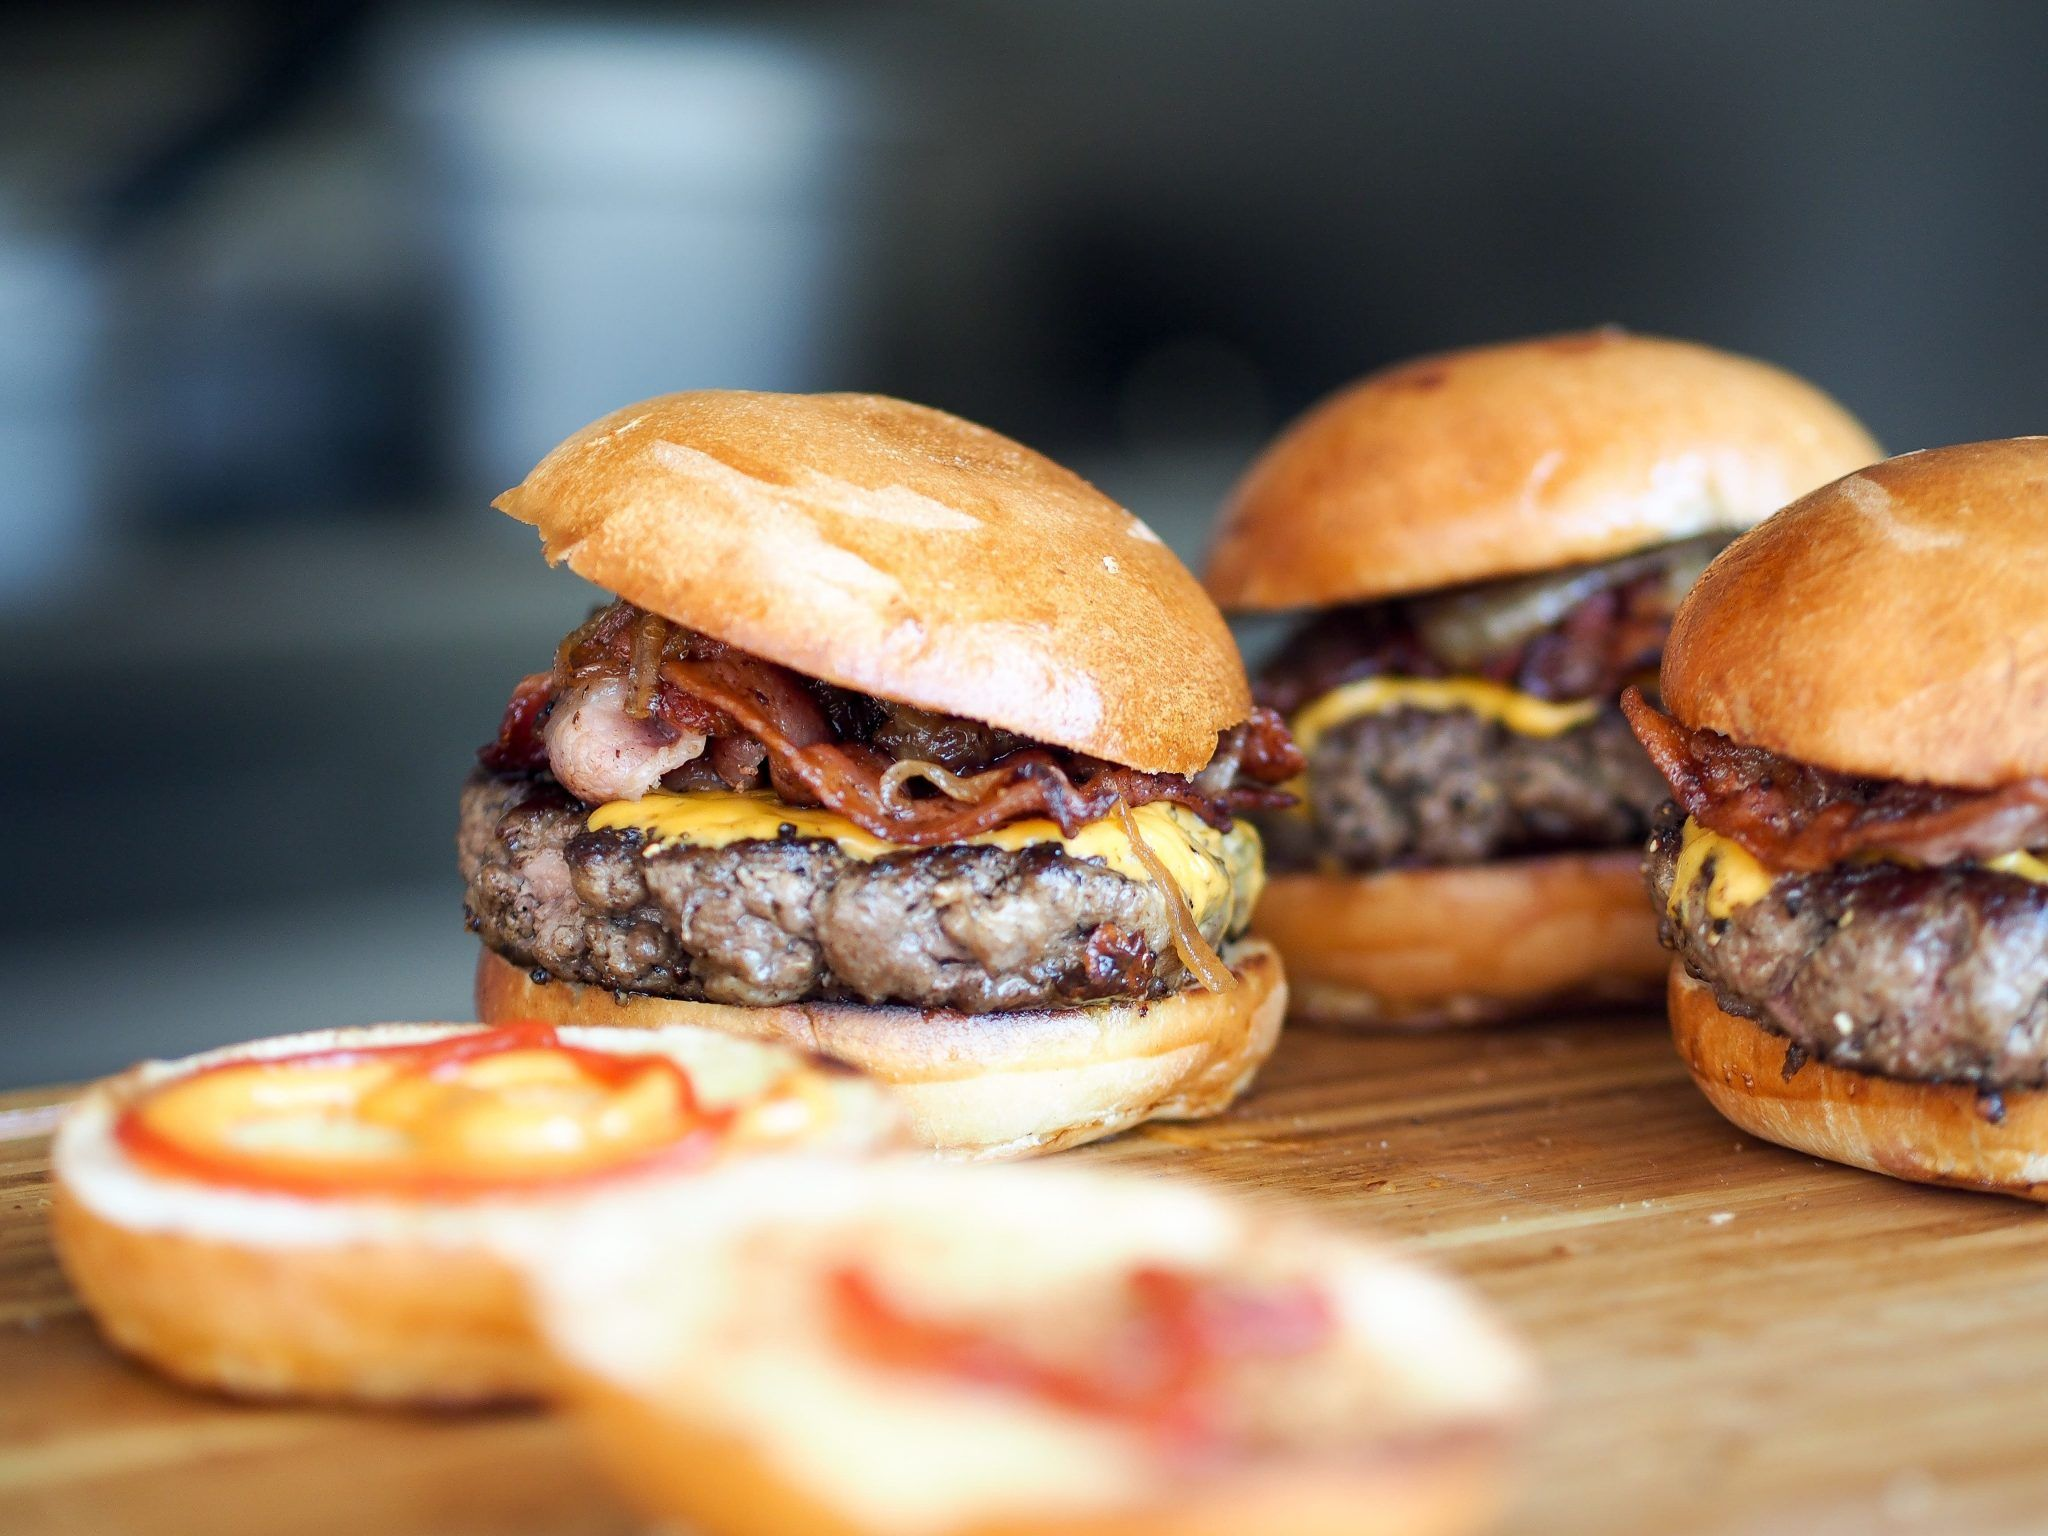 hamburguesas en una tabla de madera